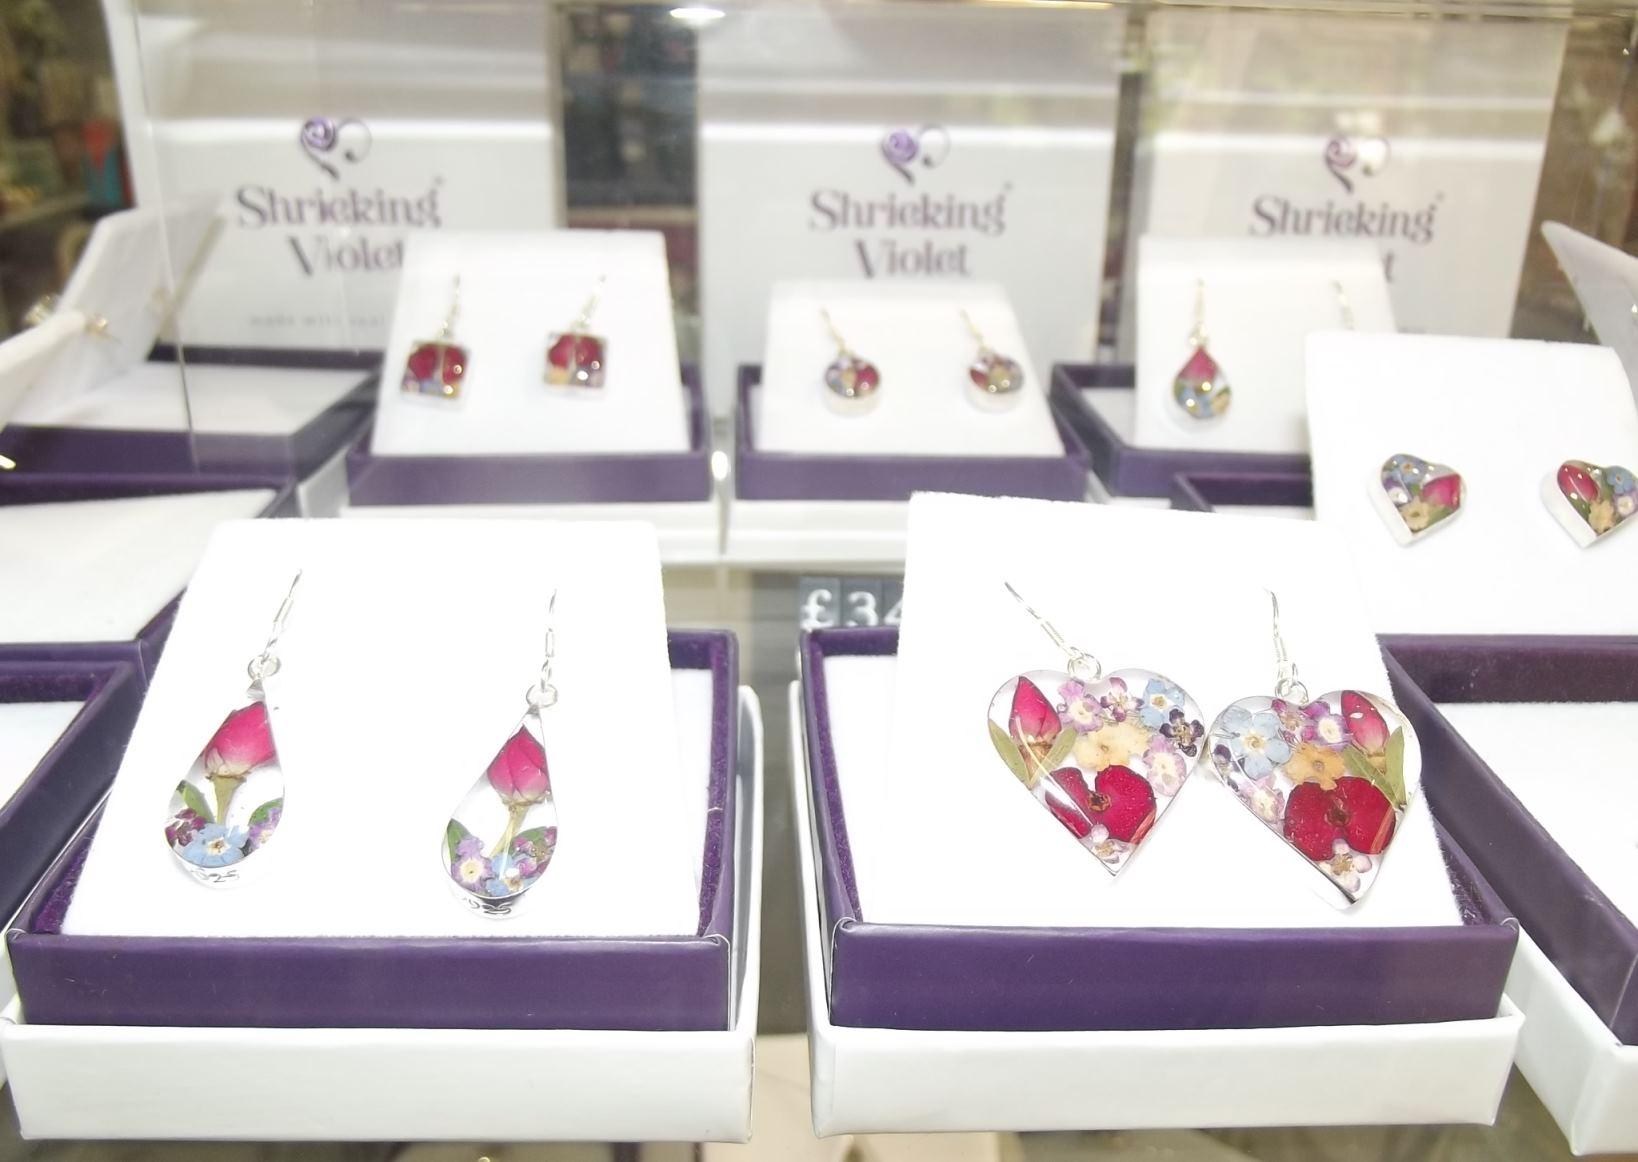 Shrieking Violet jewellery